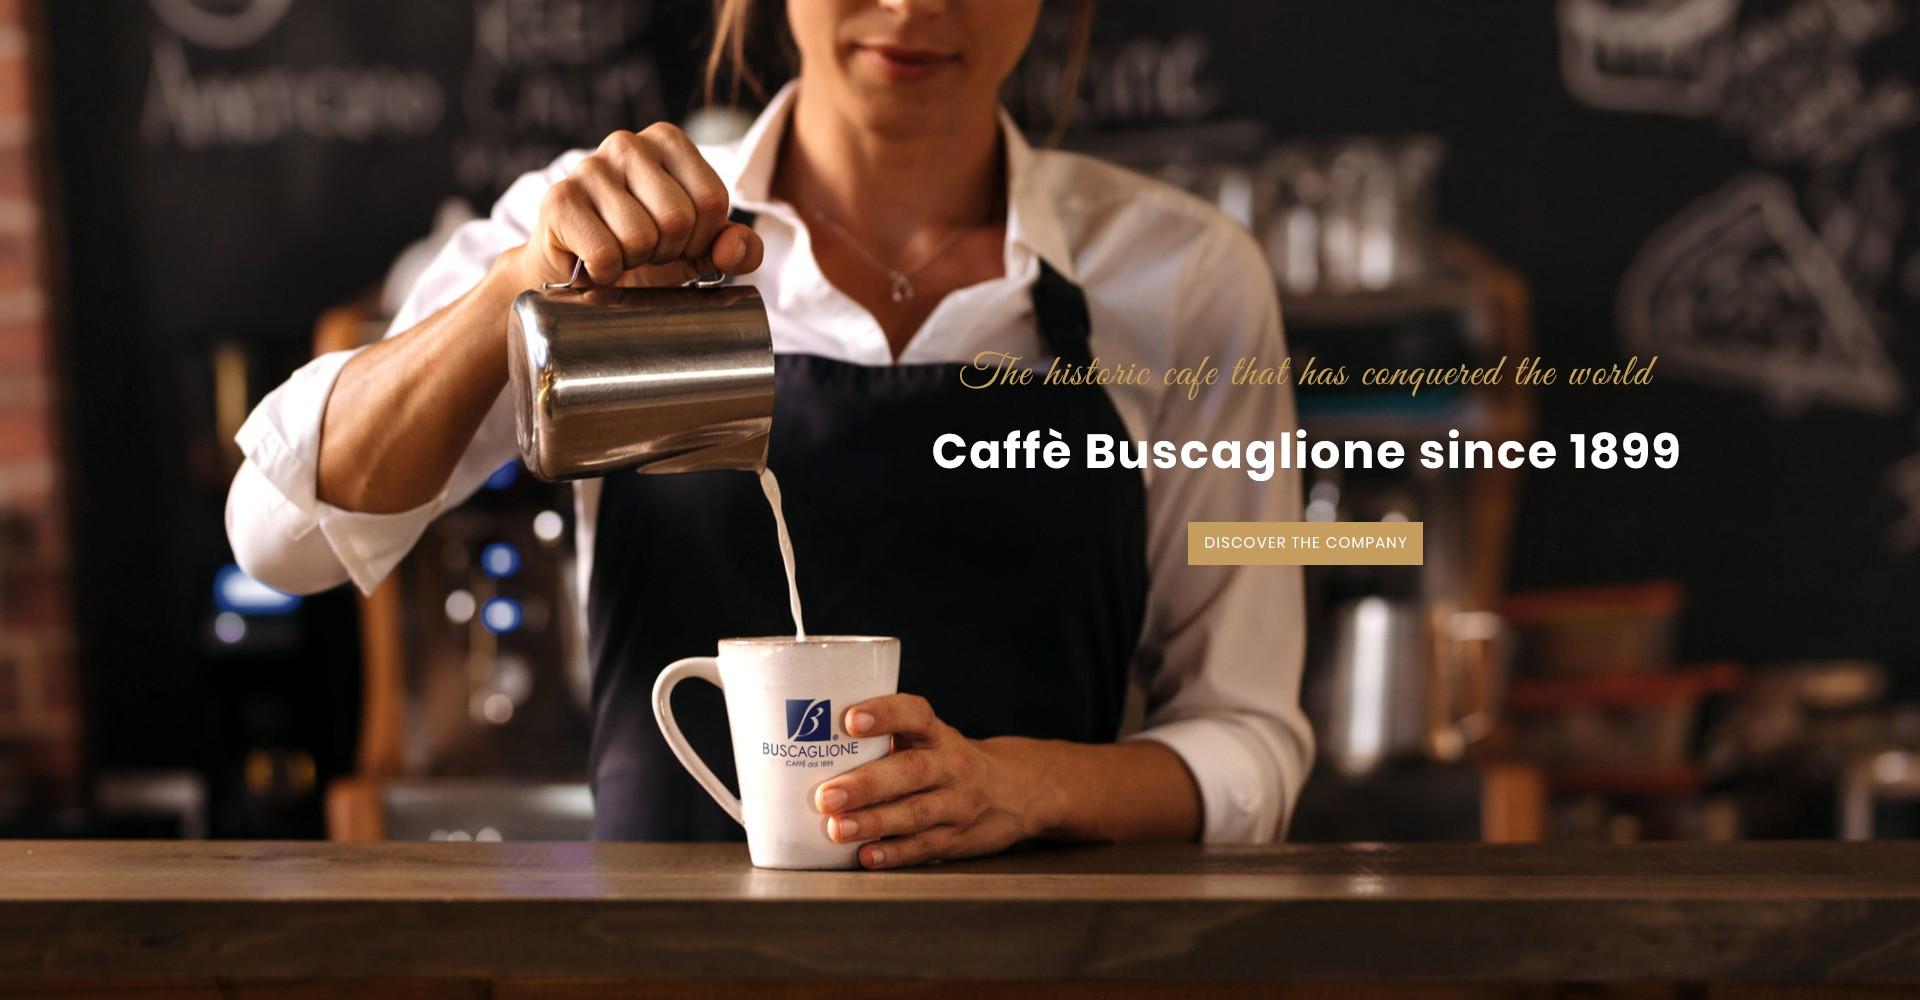 Caffè Buscaglione since 1899